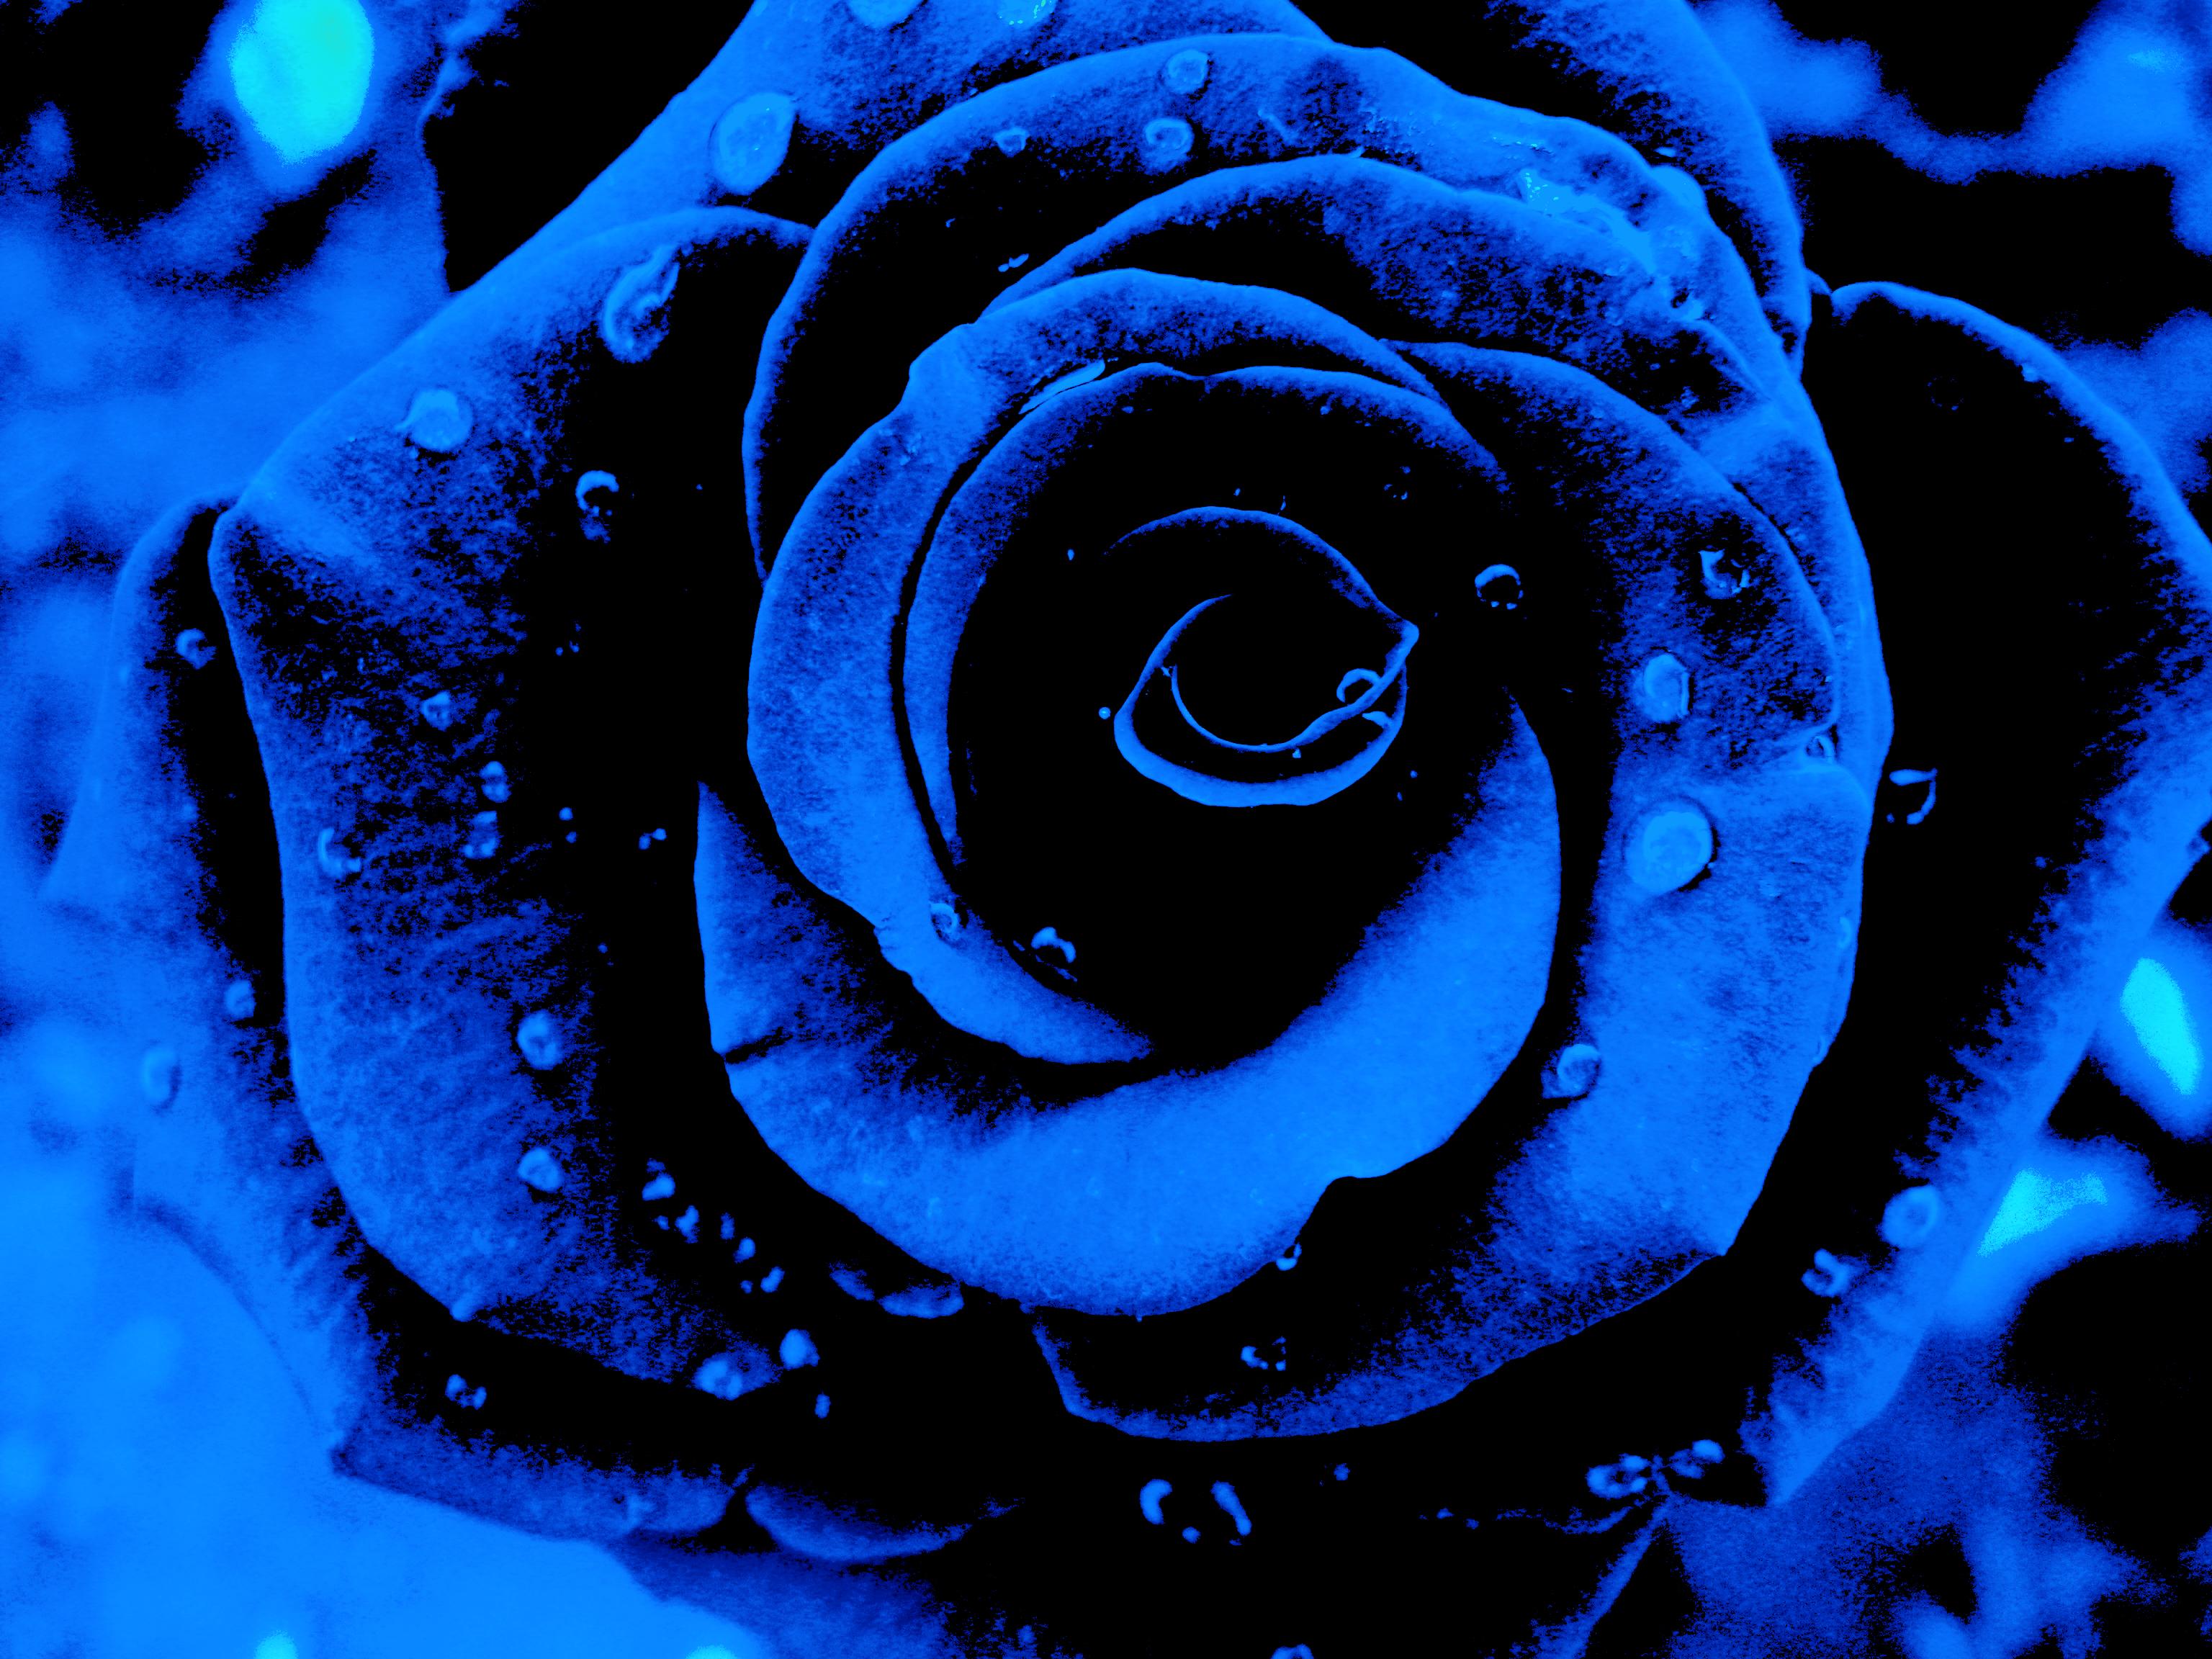 Free photo blue flower nature plants flowers free download a blue flower by kocznarg on deviantart izmirmasajfo